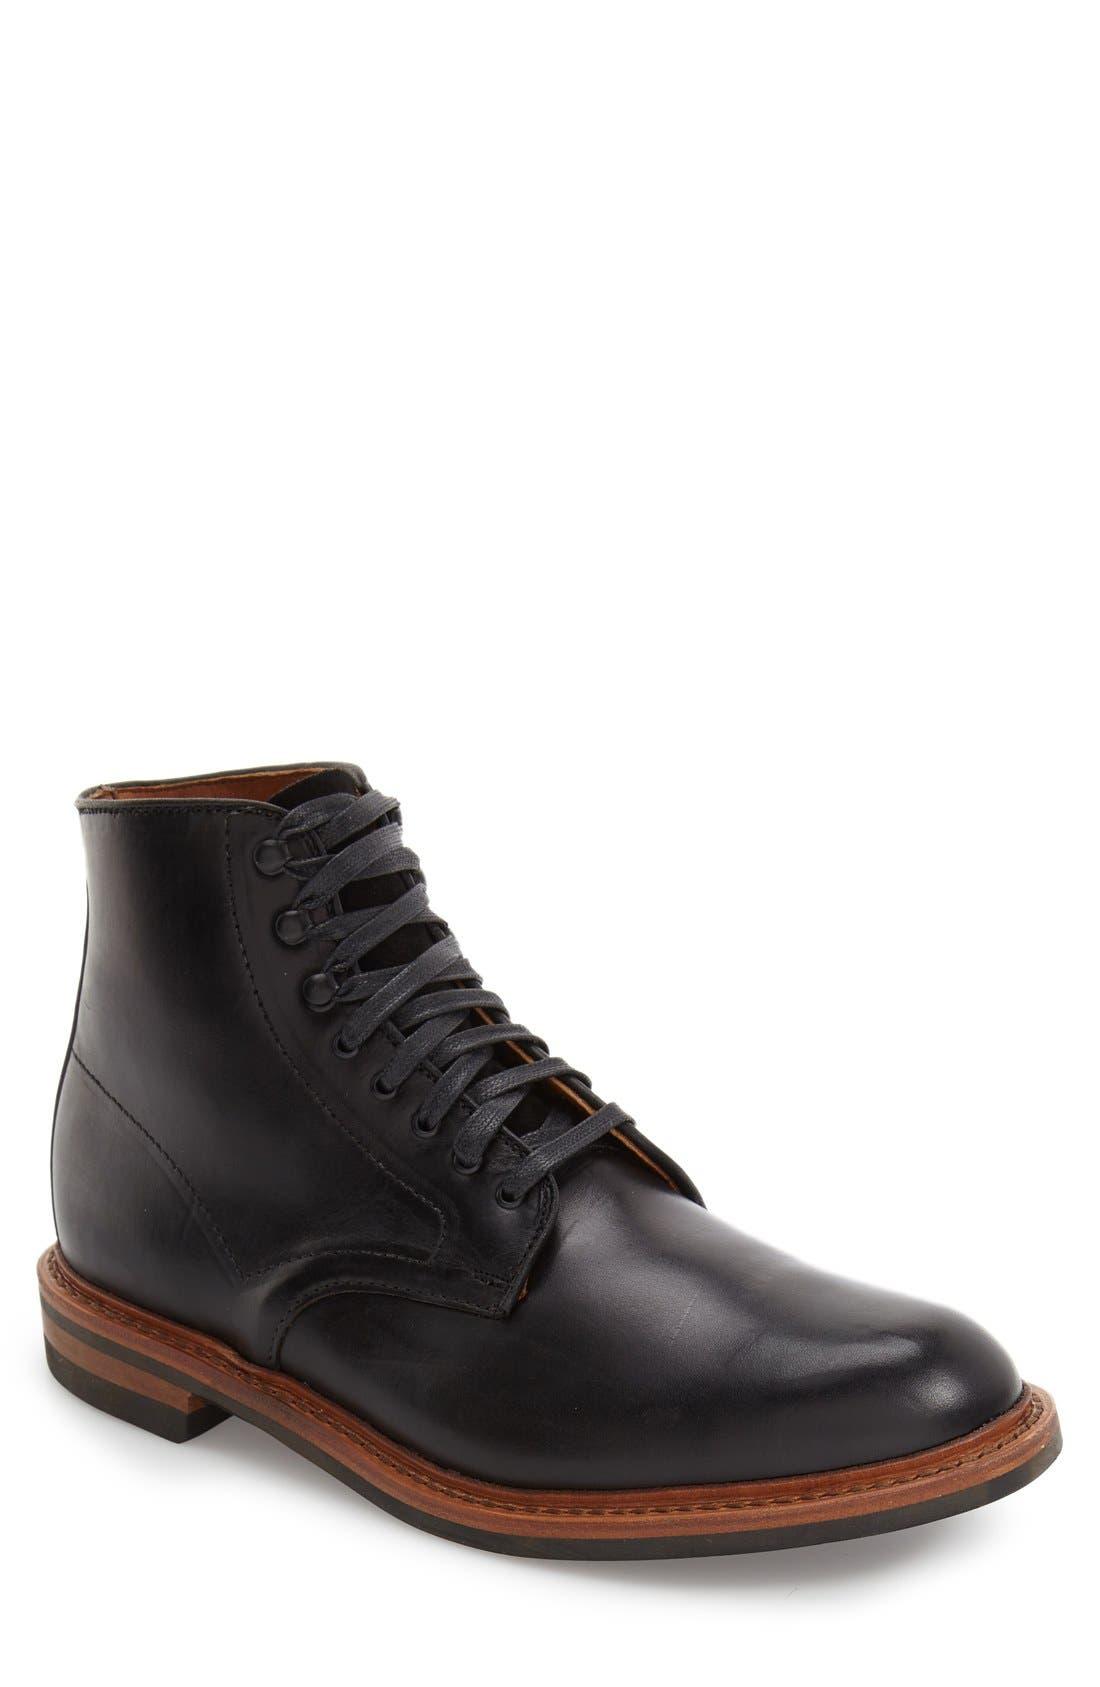 'Higgins Mill' Plain Toe Boot,                             Main thumbnail 1, color,                             001